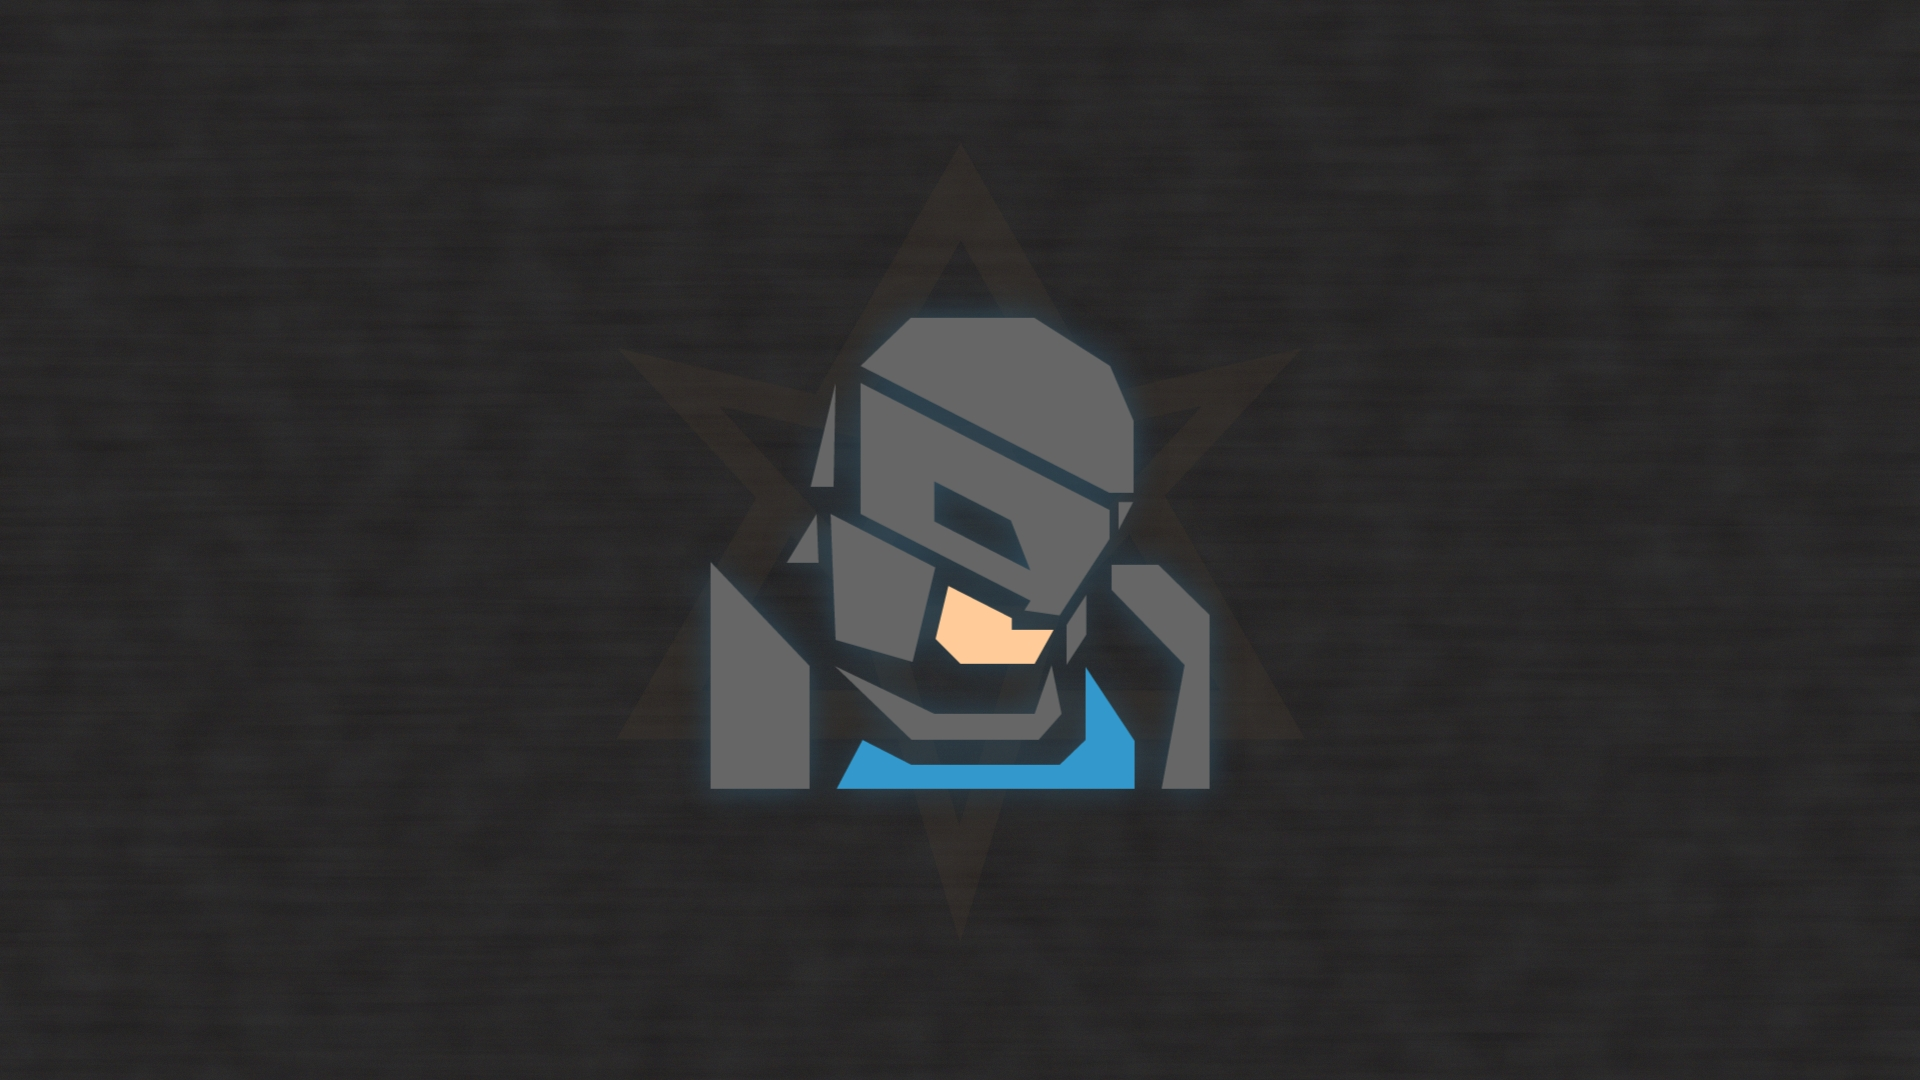 Icon for Face controller